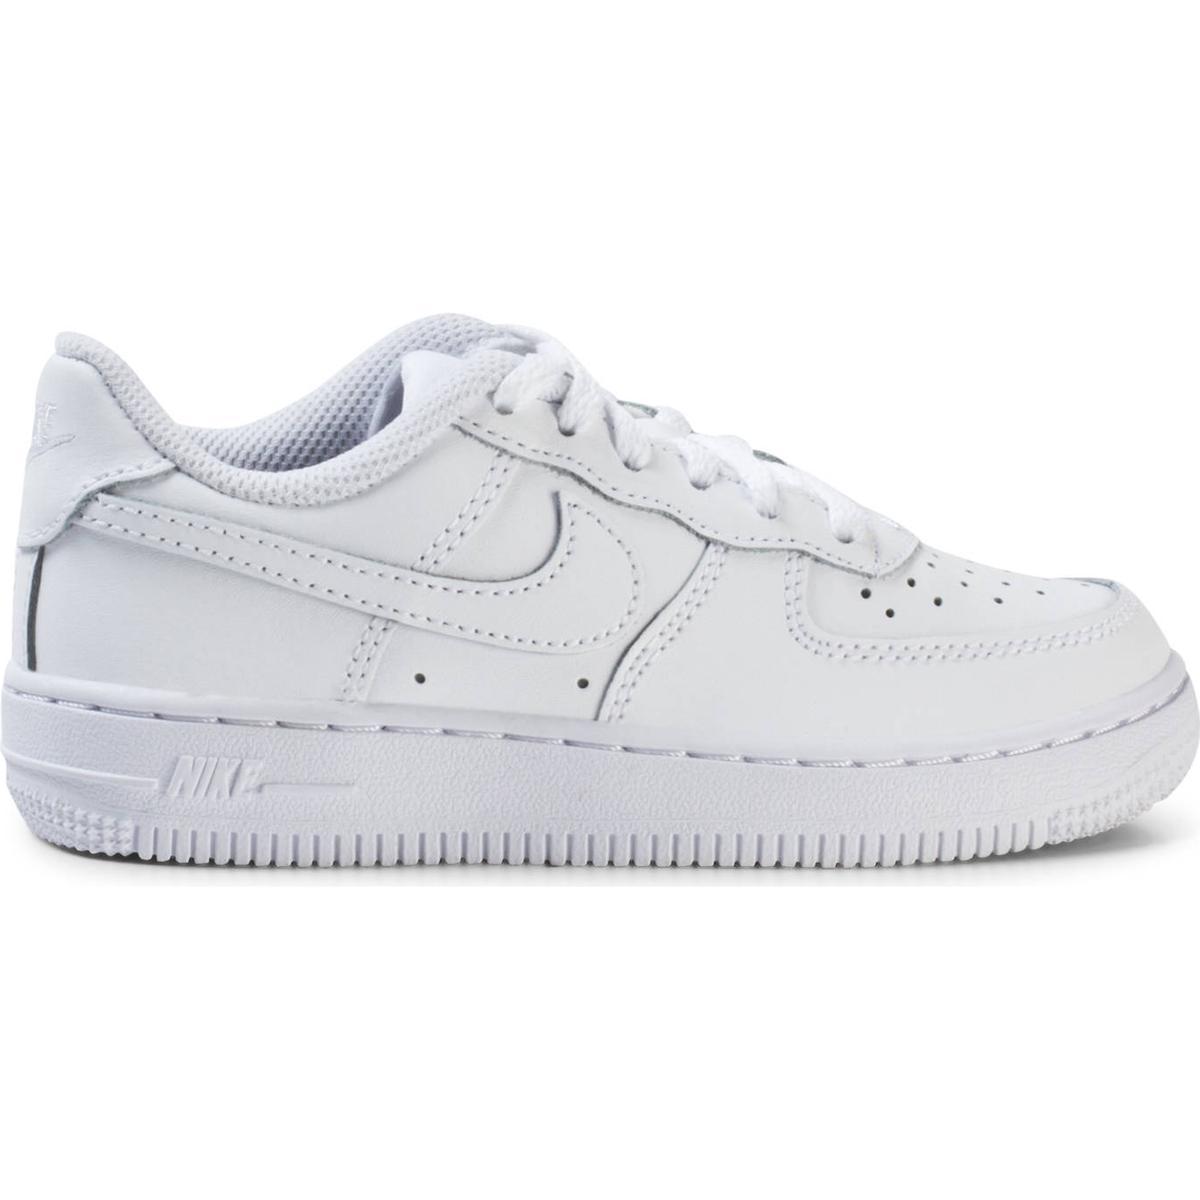 44fd2aa1ae0 Nike Børnesko - Sammenlign priser hos PriceRunner